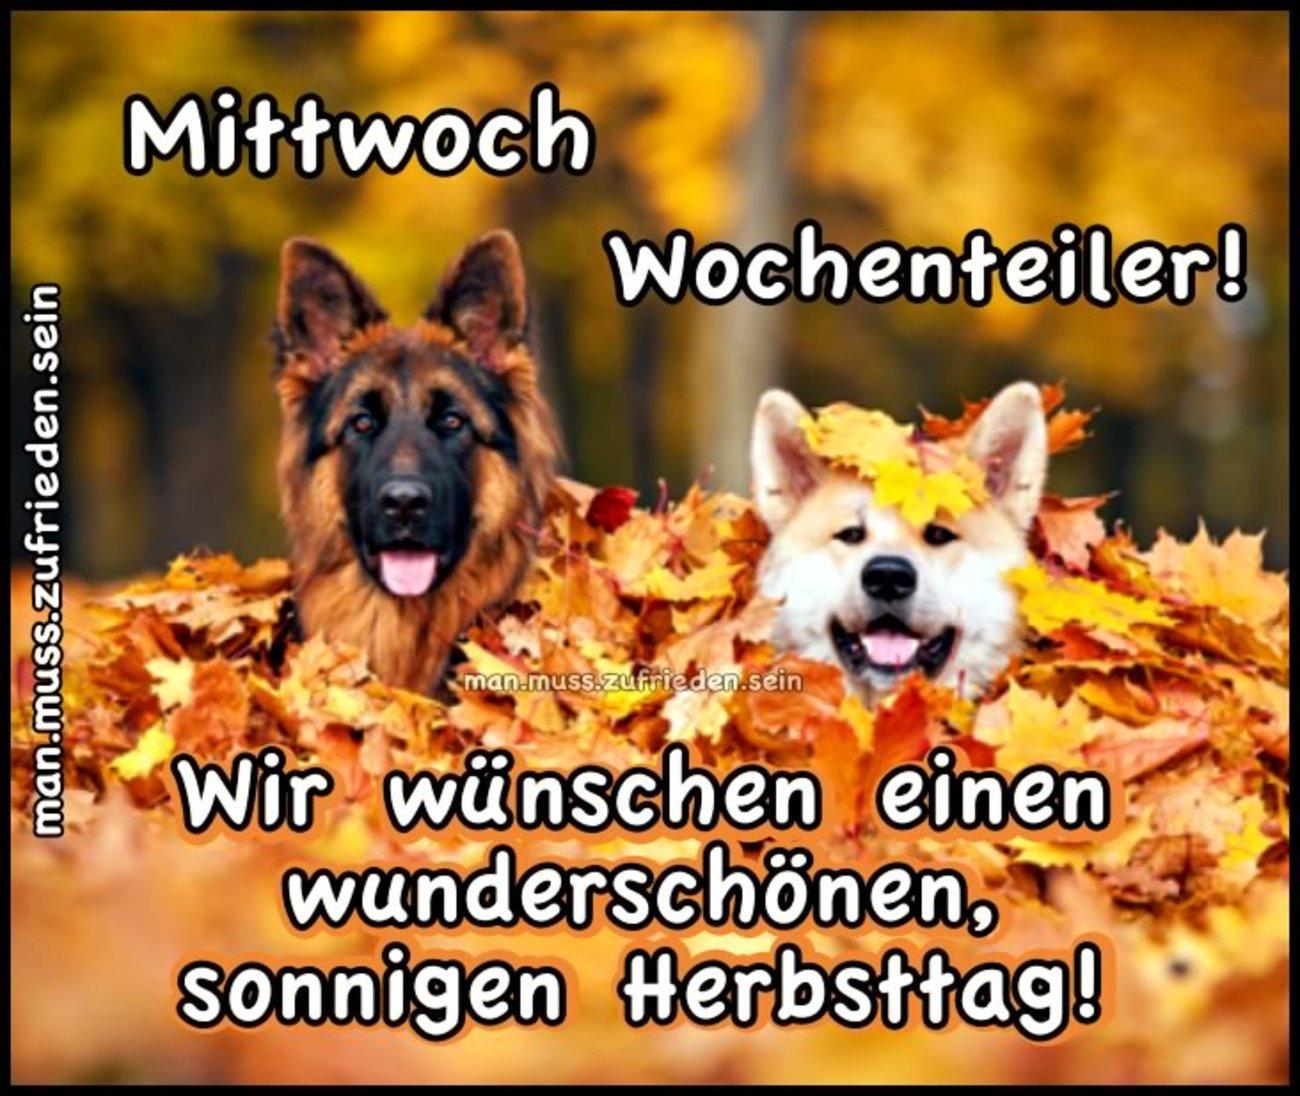 Schönen Mittwoch Herbst Gbpicsbildercom